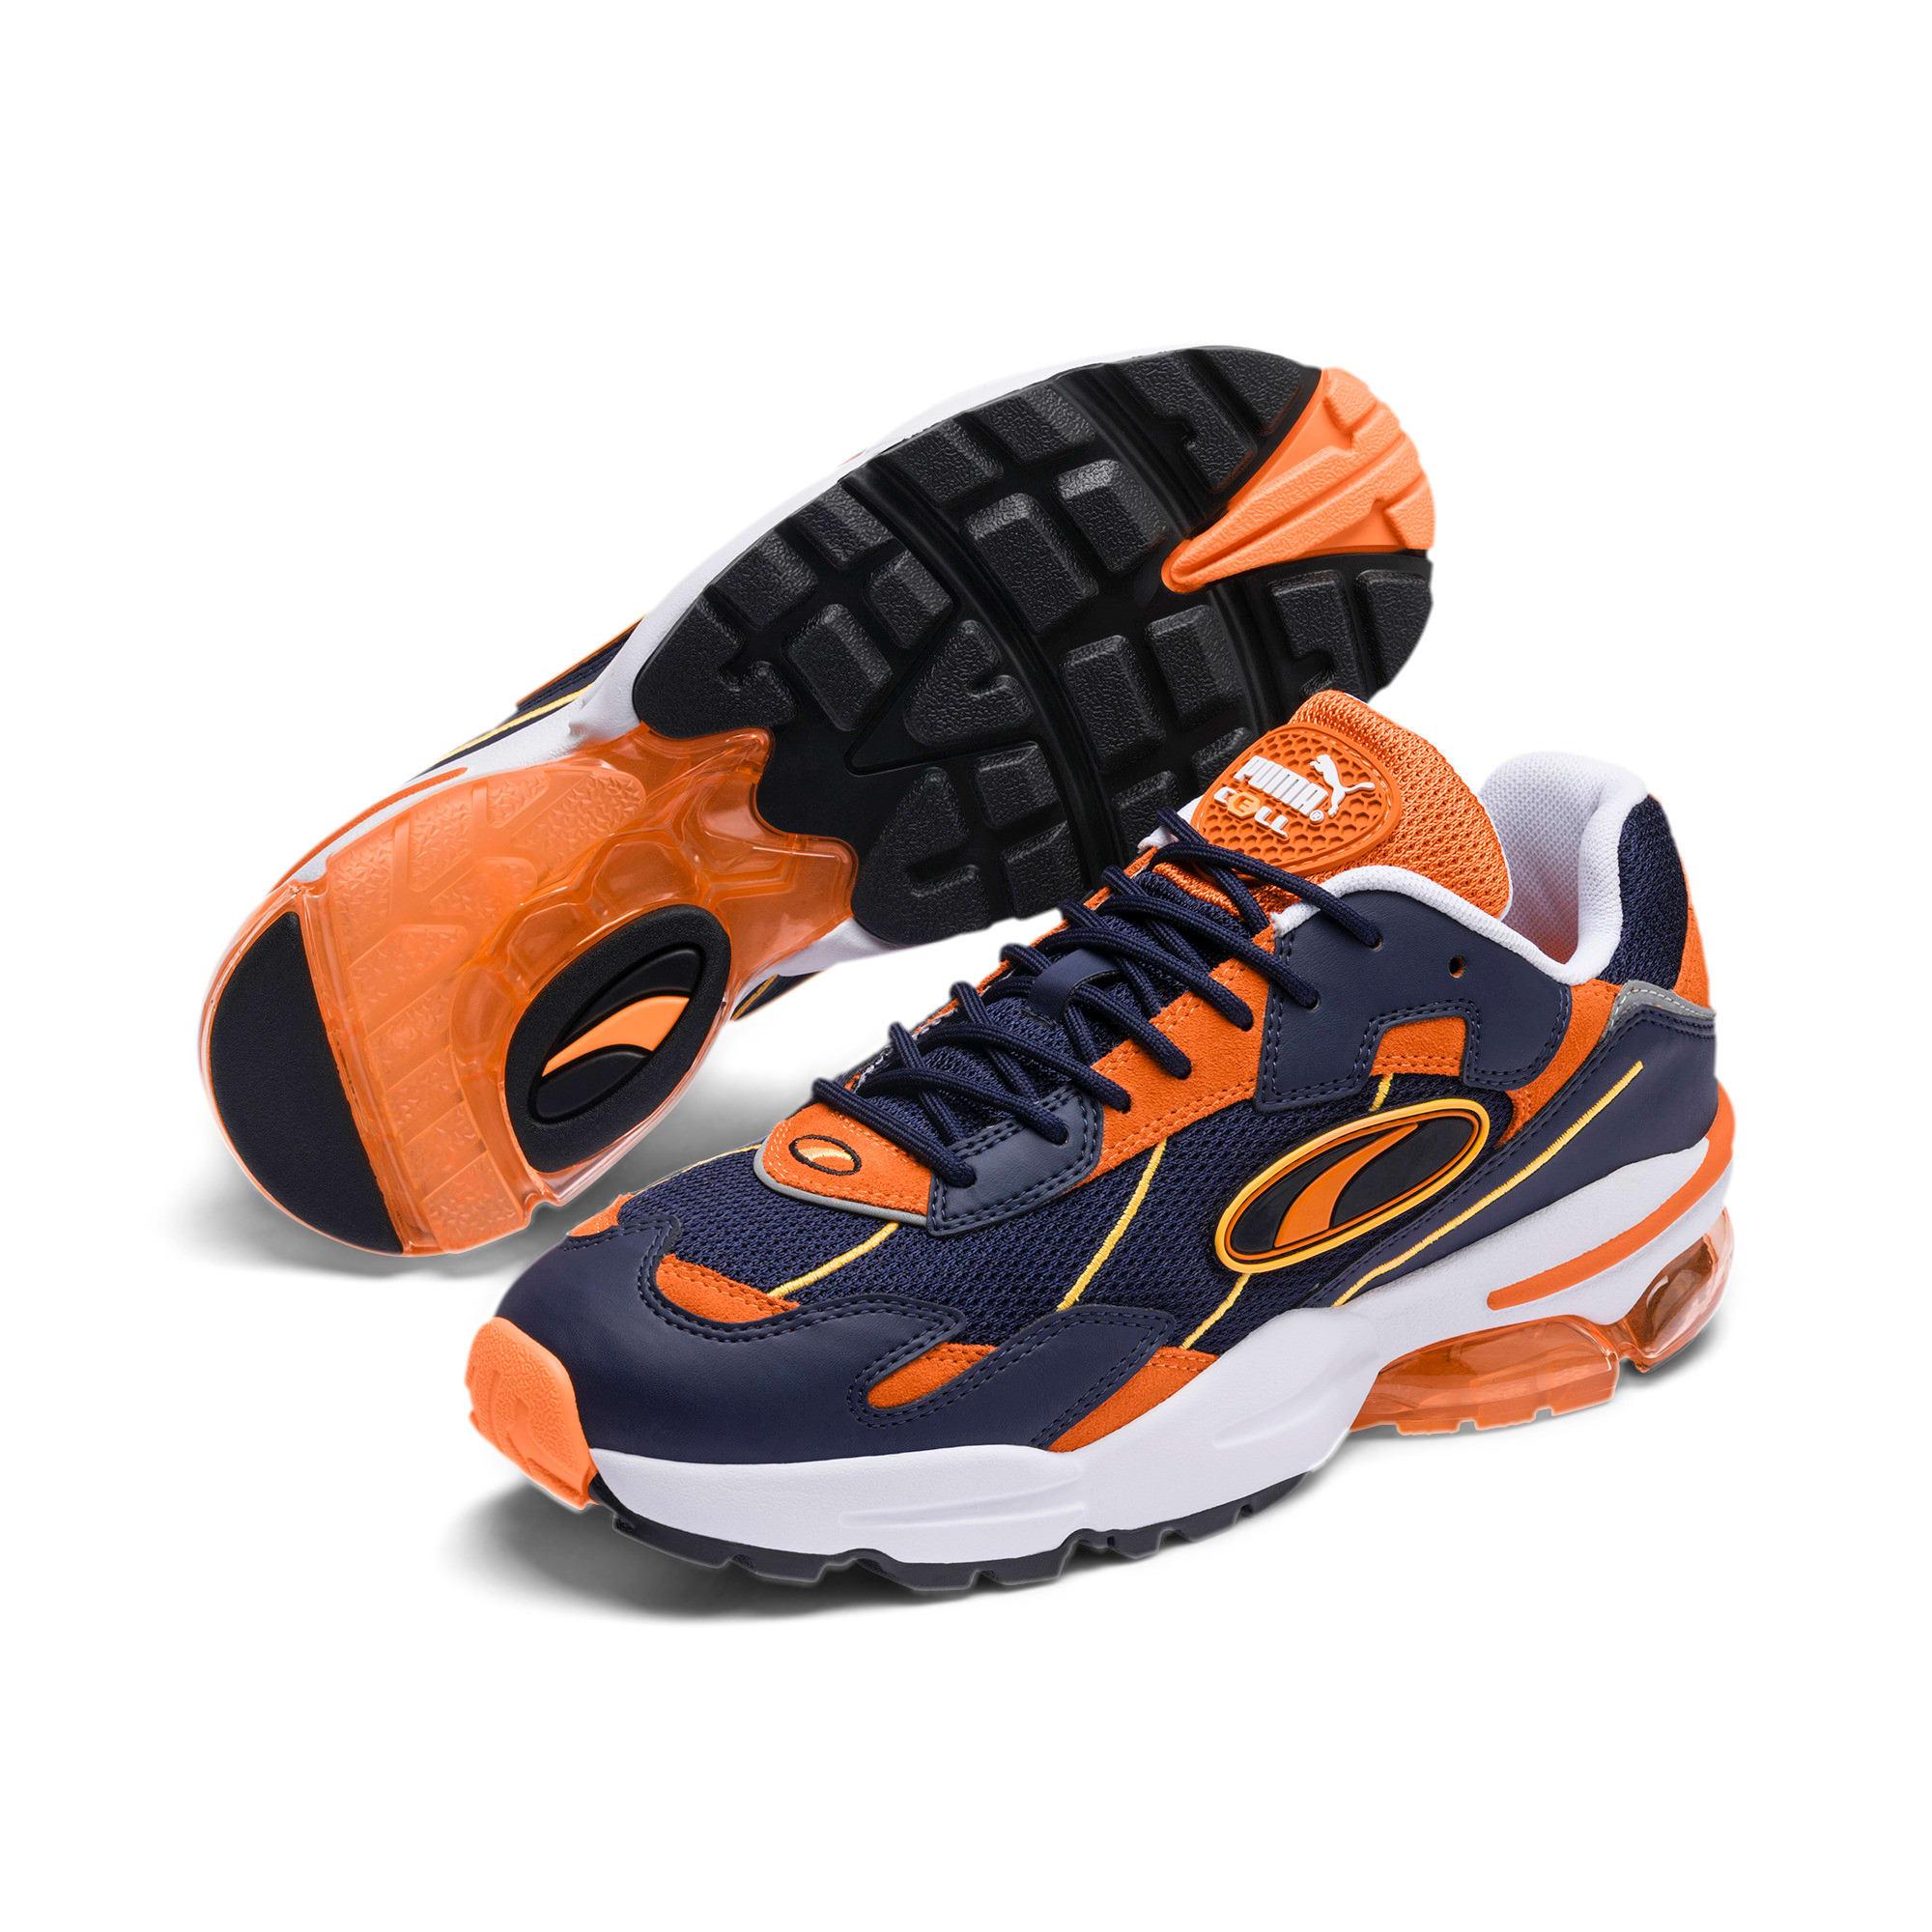 Thumbnail 3 of CELL Ultra OG Pack Sneakers, Peacoat-Jaffa Orange, medium